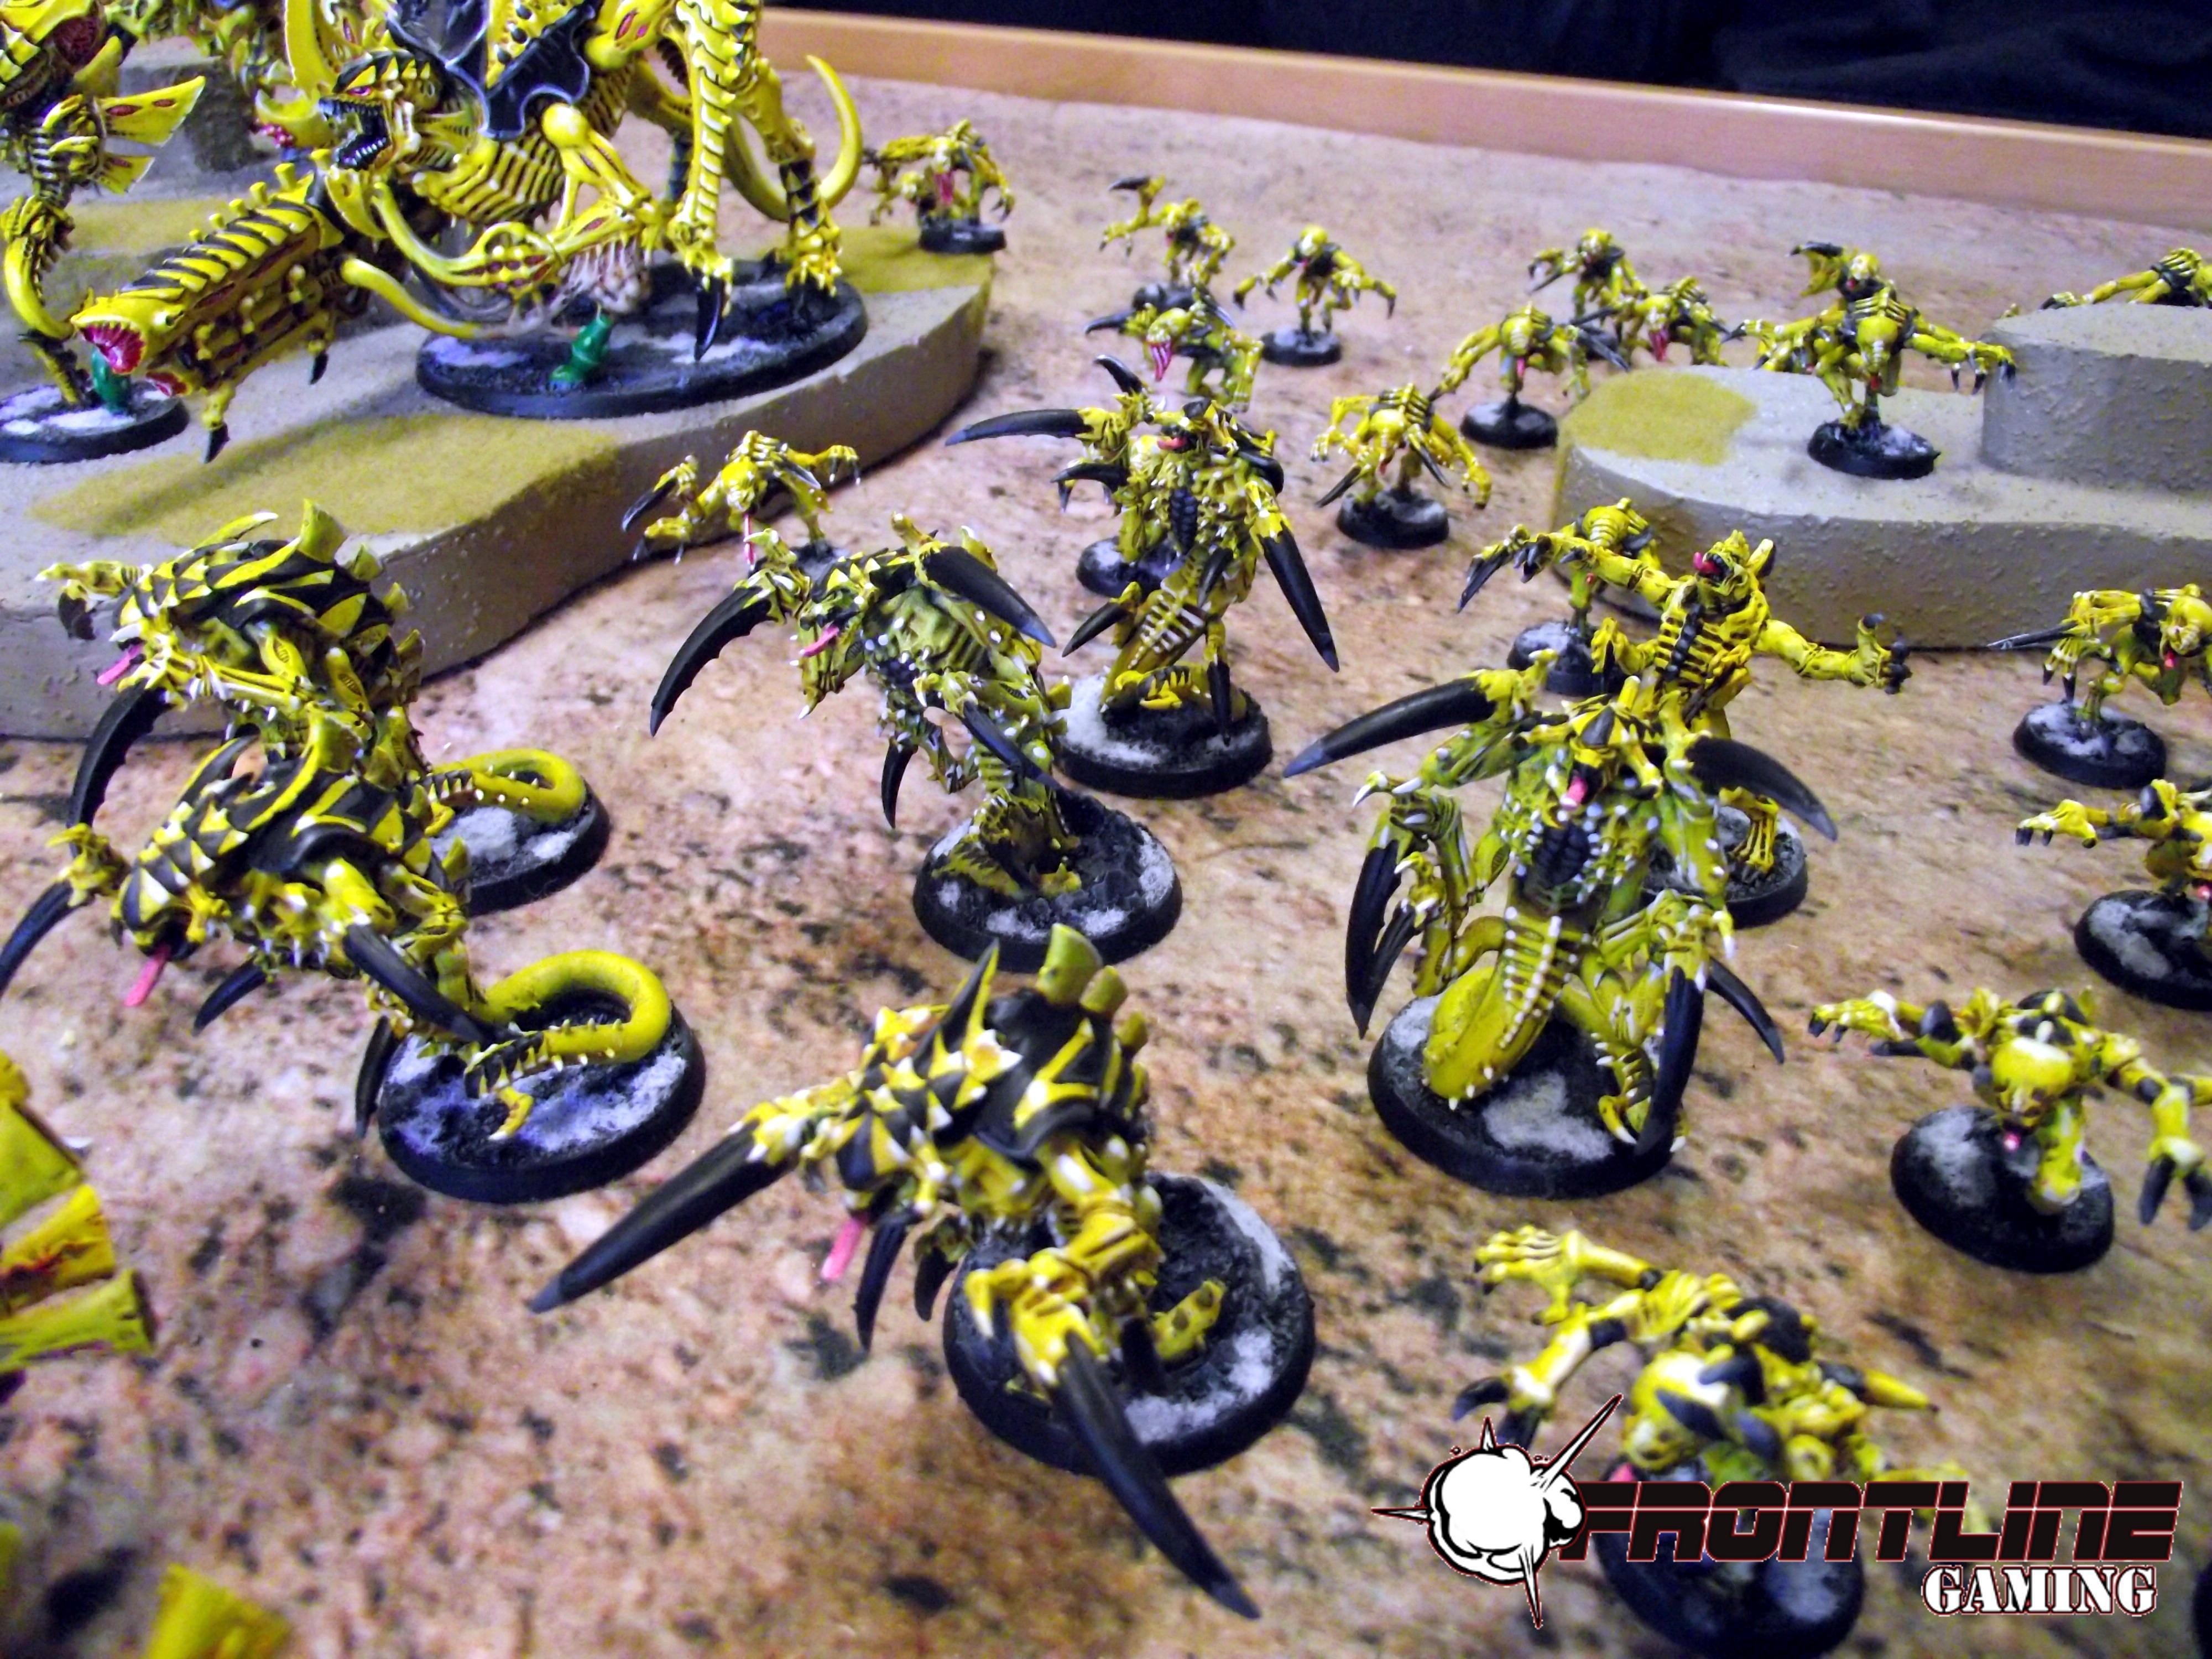 Frontline, Striking, Swarm, Tyranids